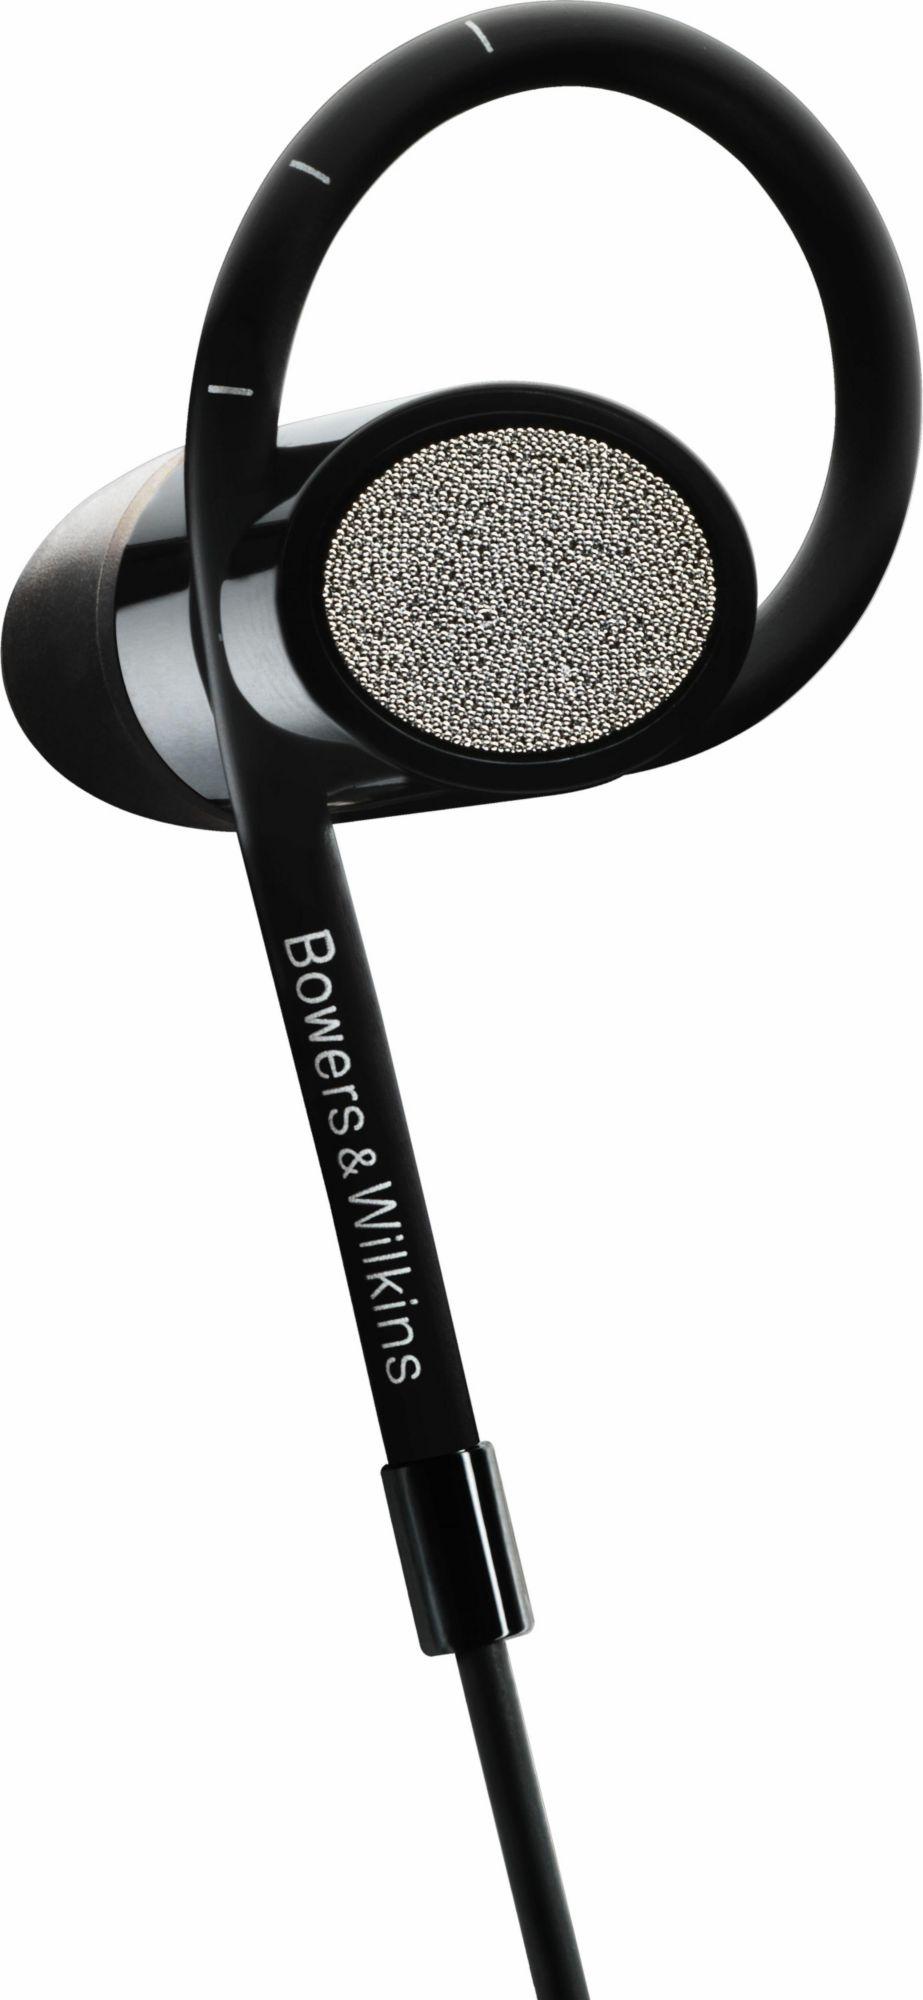 BOWERS WILKINS .Bowers & Wilkins C5 Series 2 In Ear-Kopfhörer schwarz